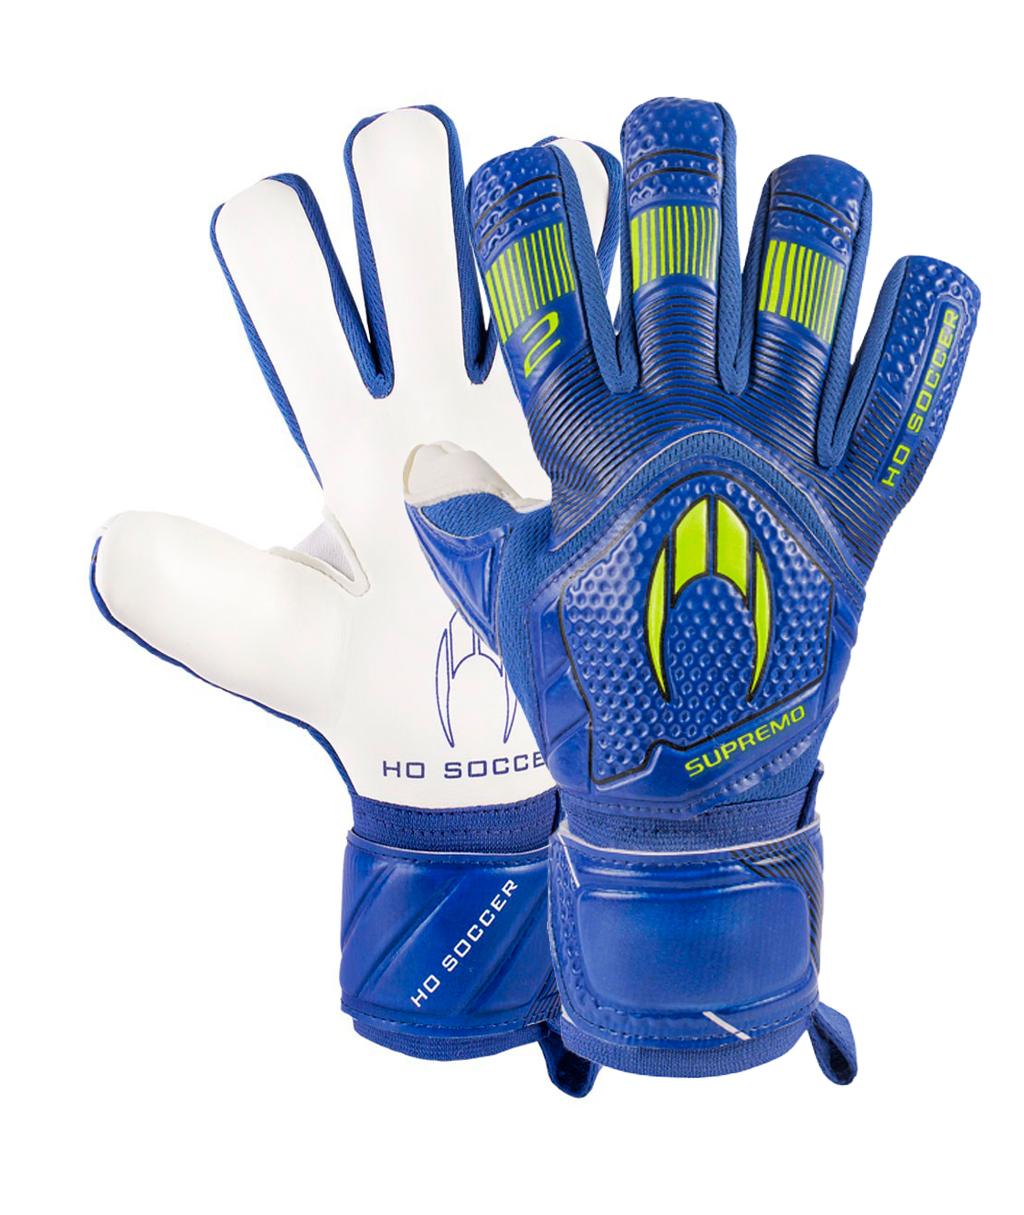 Перчатки HO Soccer CLONE SUPREMO II NEGATIVE STORM BLUE 051.0716